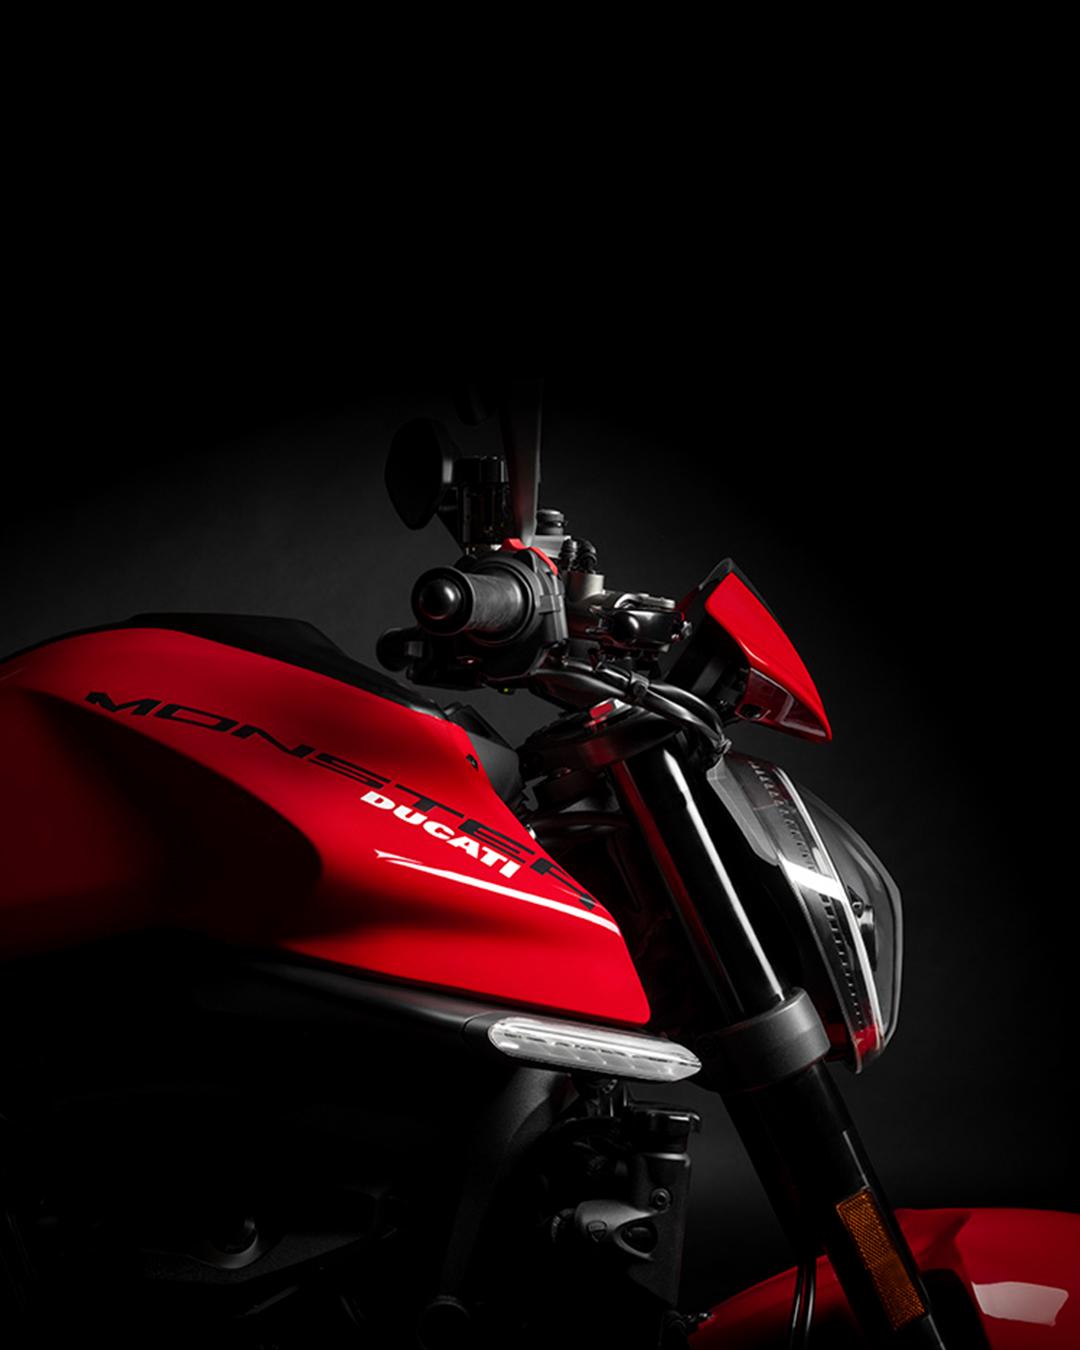 Ducati_IG_0212_Post_01_c_UC214710